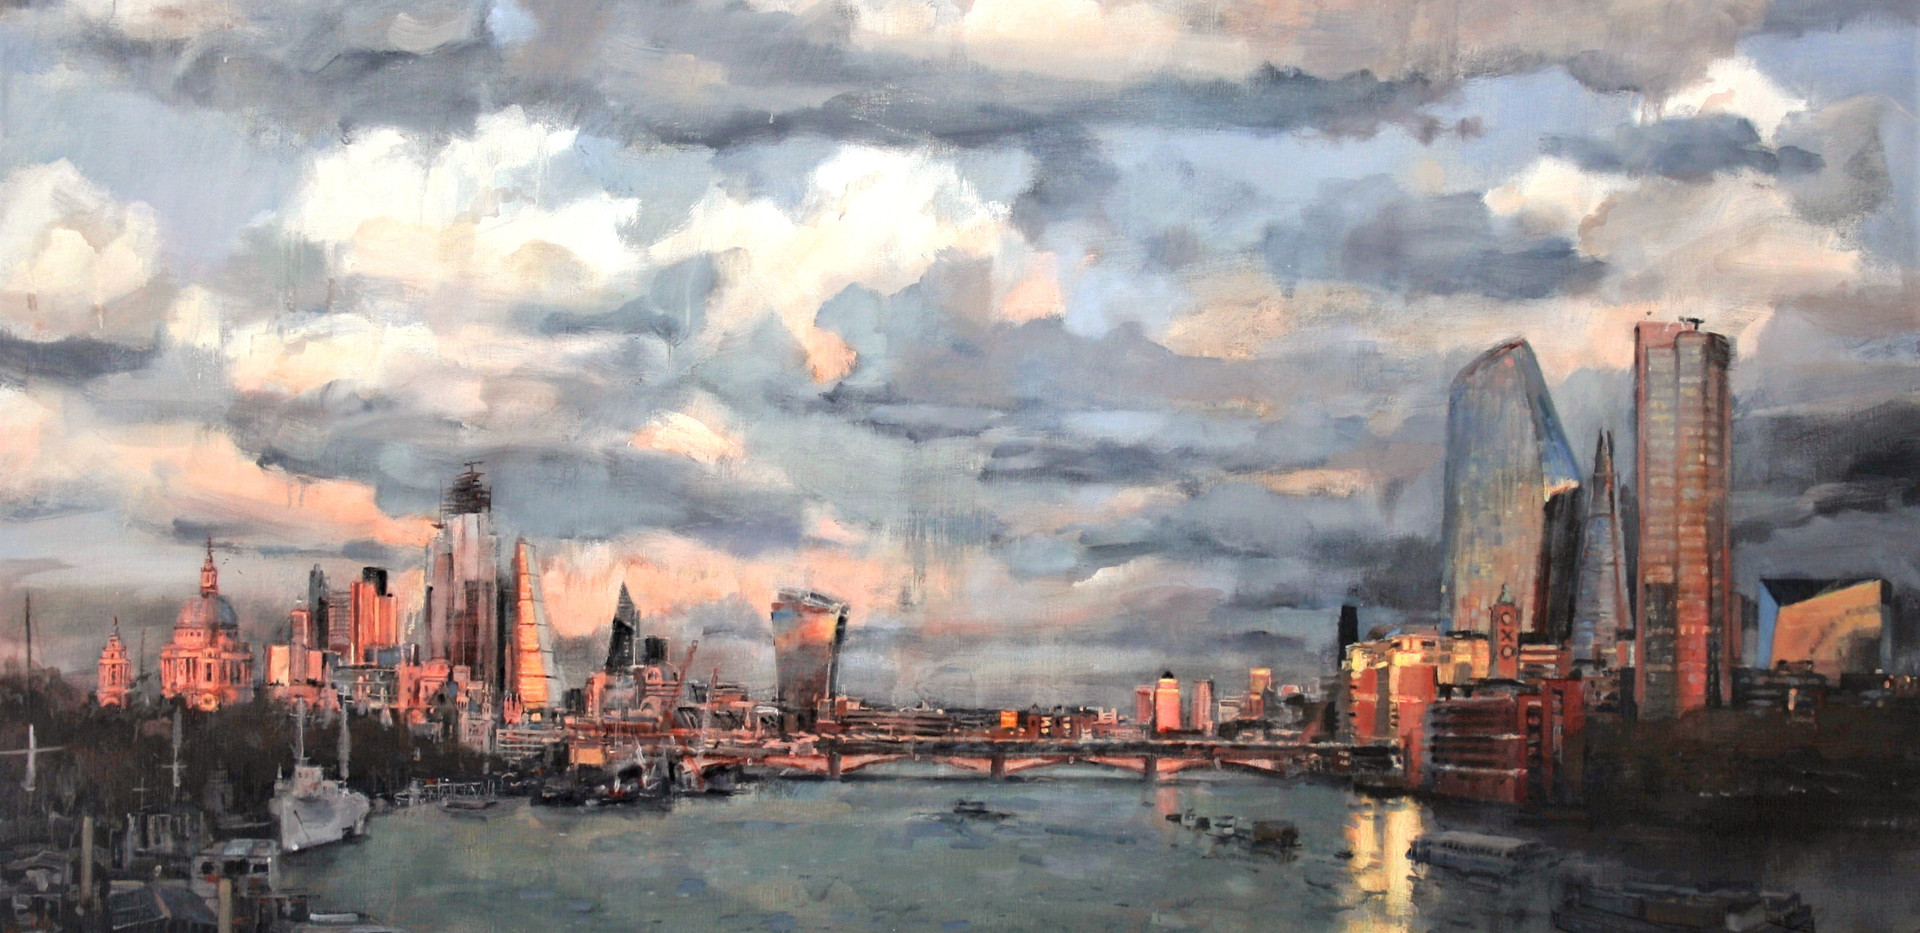 View from Waterloo Bridge 2019